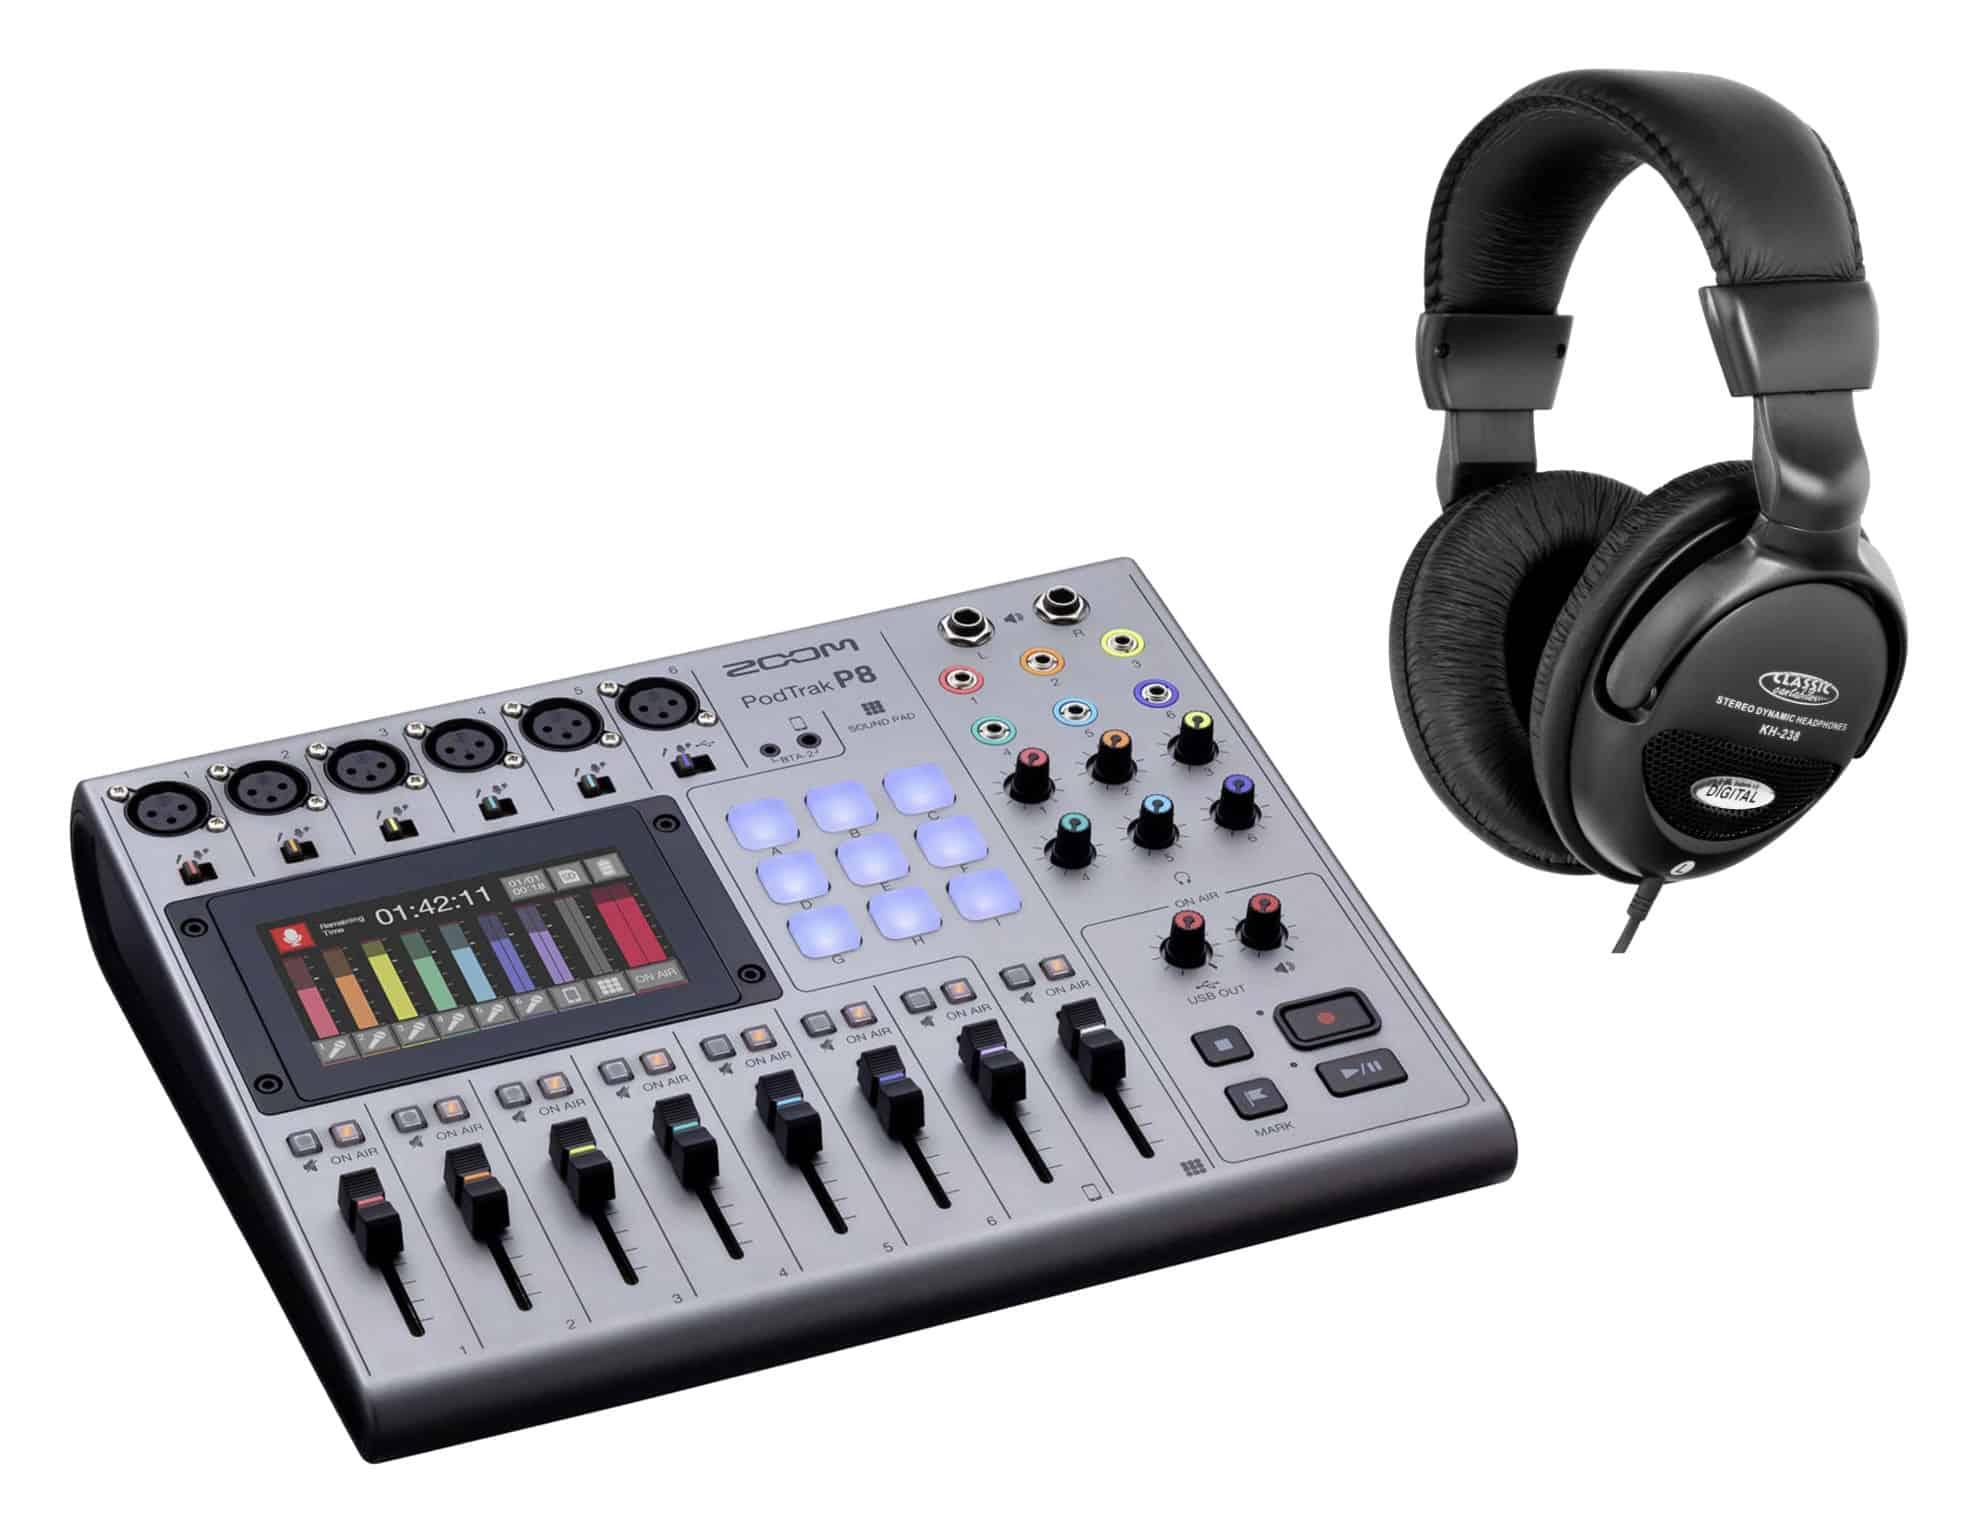 Pchardware - Zoom PodTrak P8 Podcasting Recorder Set - Onlineshop Musikhaus Kirstein